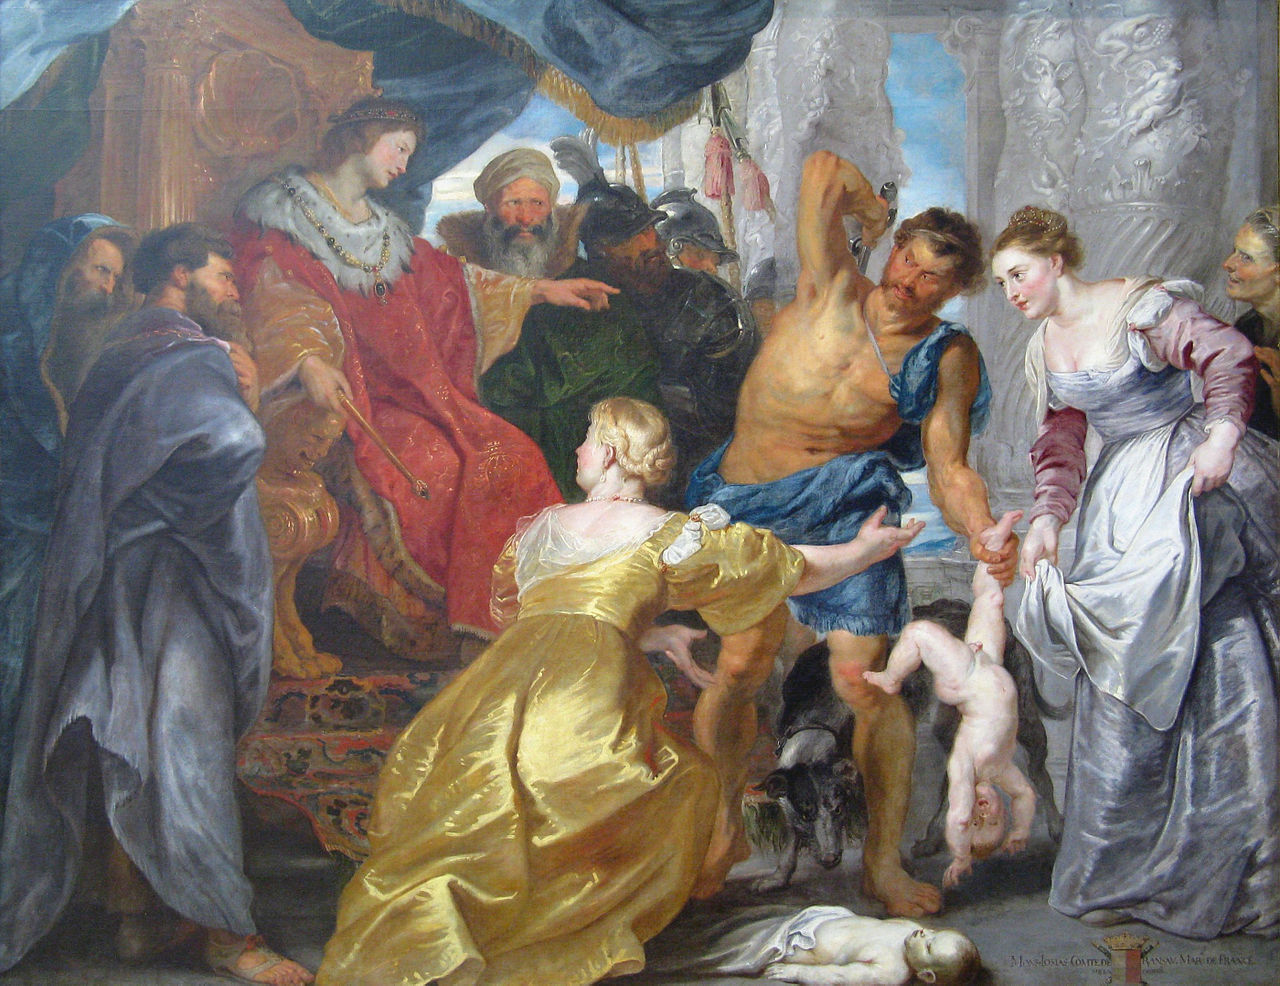 image:   The Judgment of Solomon   , Peter Paul Rubens (1577 - 1640).